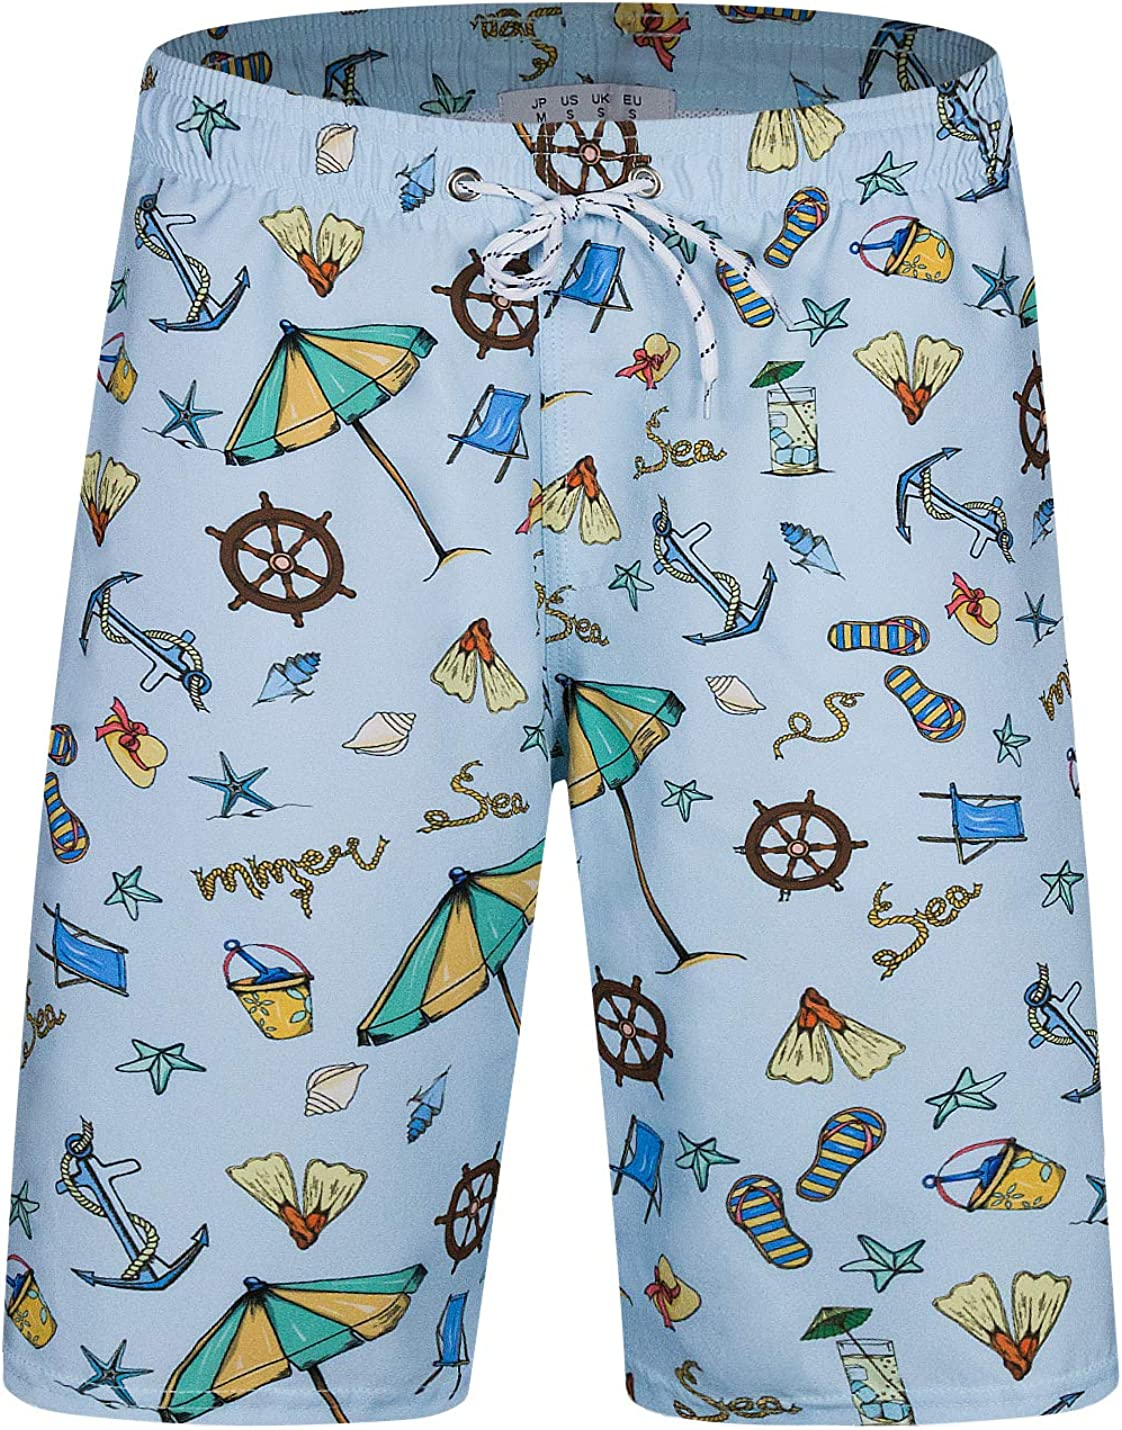 Horizon-t Beach Shorts Starry Sky Mens Fashion Quick Dry Beach Shorts Cool Casual Beach Shorts